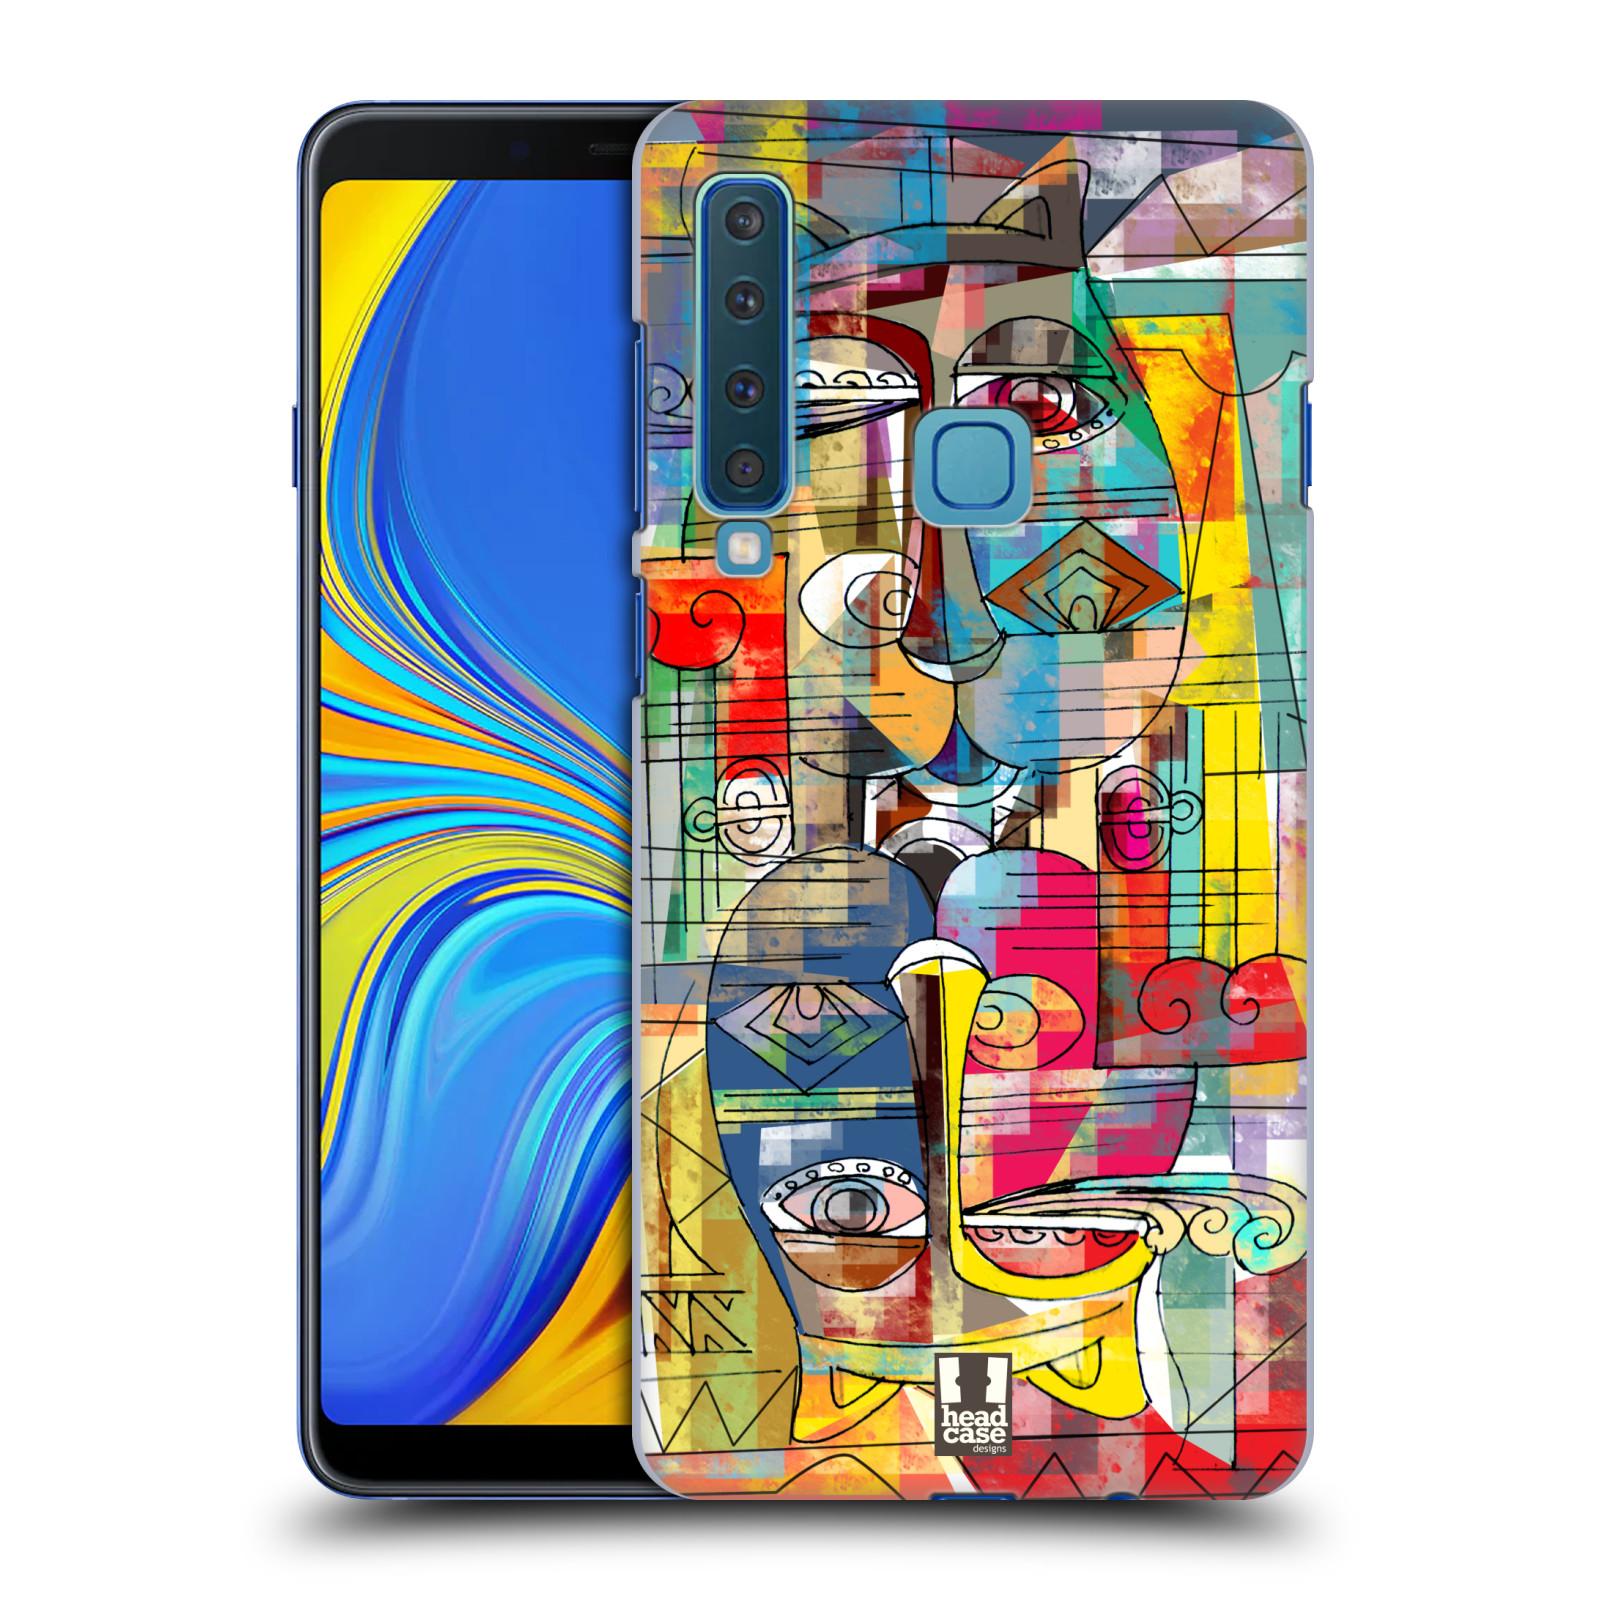 Plastové pouzdro na mobil Samsung Galaxy A9 (2018) - Head Case - AZTEC MANX